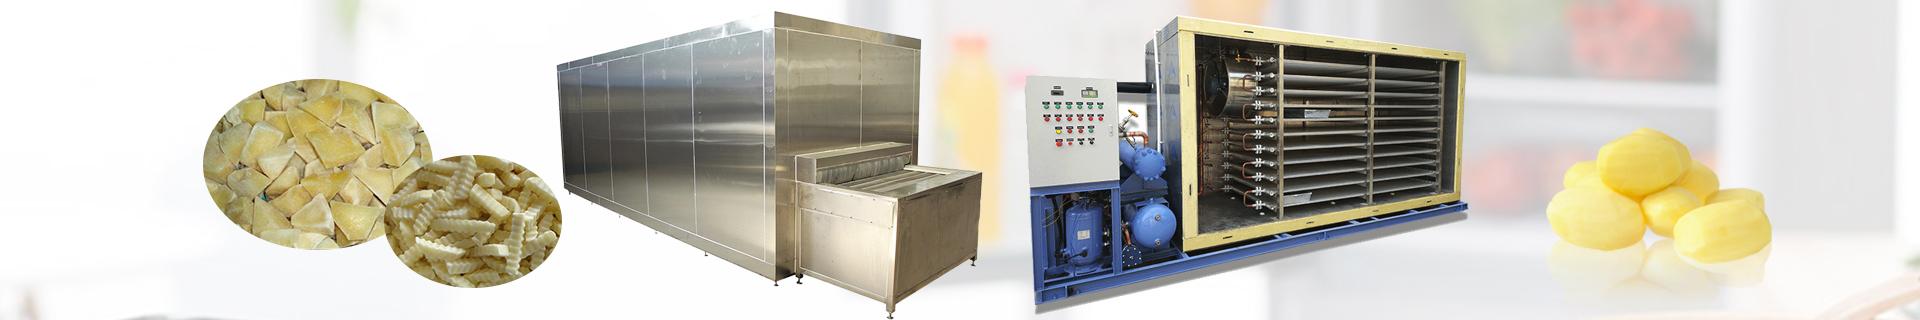 InstantFreezerMachine-Foodprocessingmachine